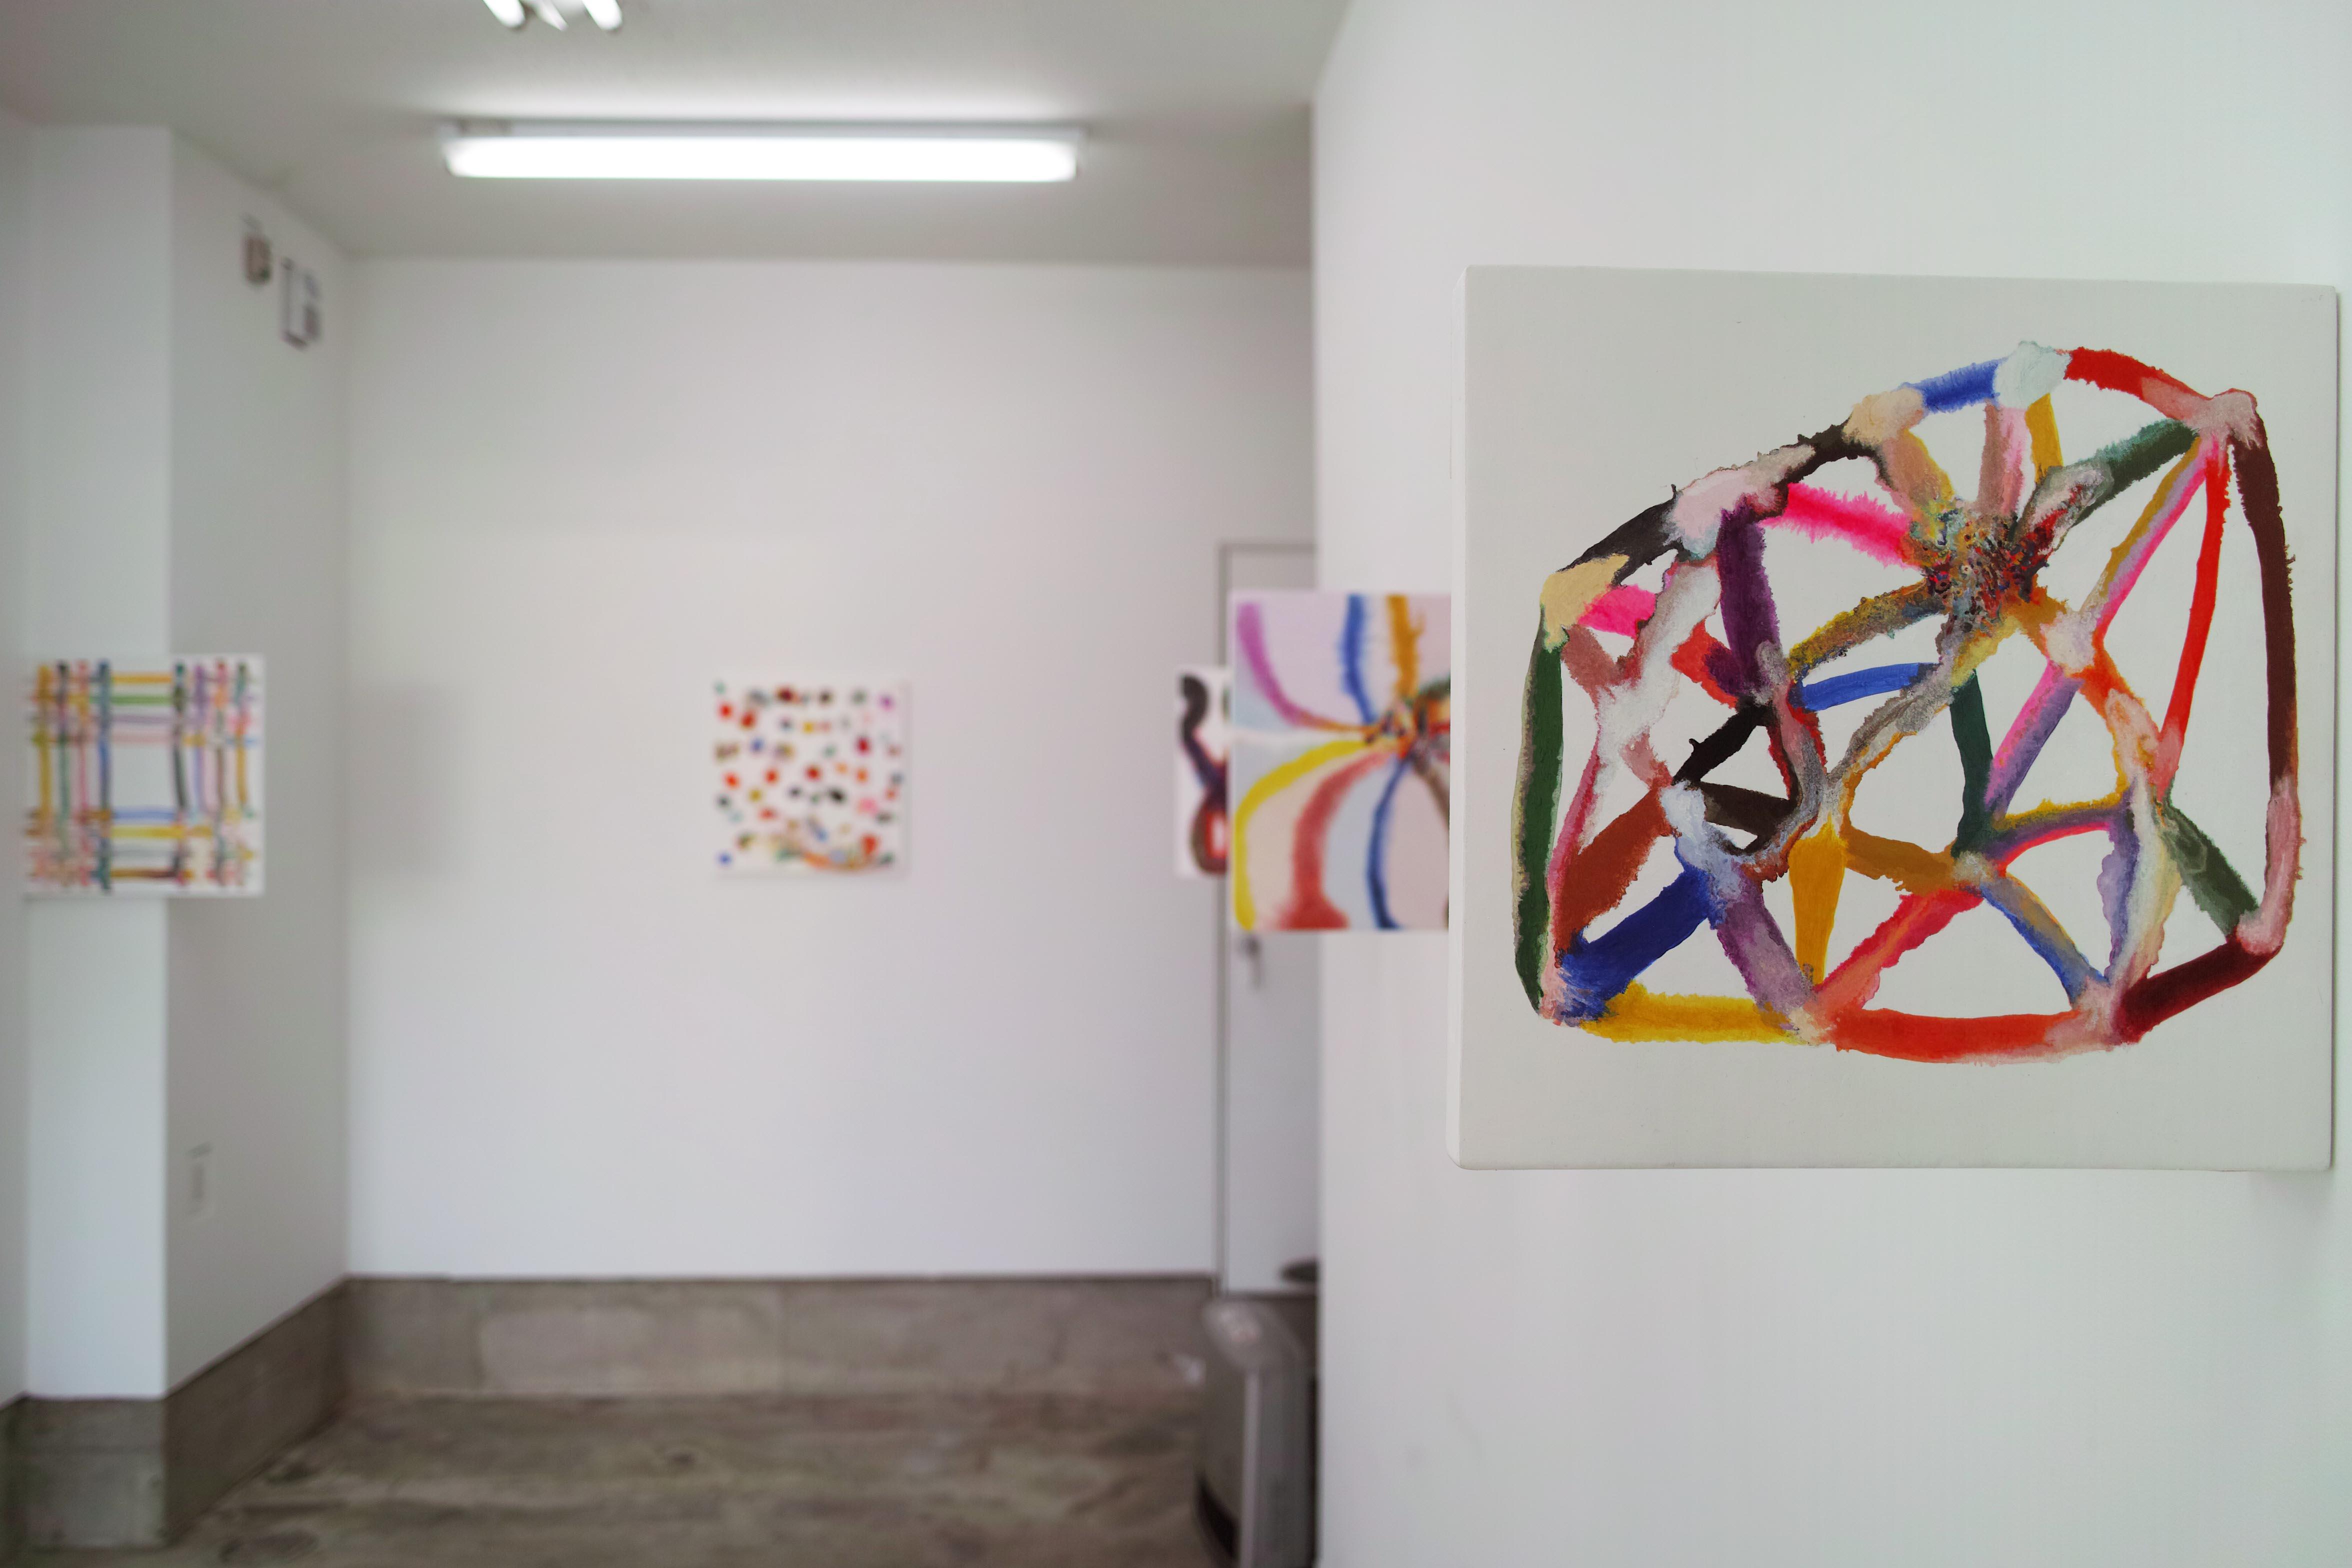 加藤巧『Clock Works』(GALLERY MIKAWAYA、愛知、2017)